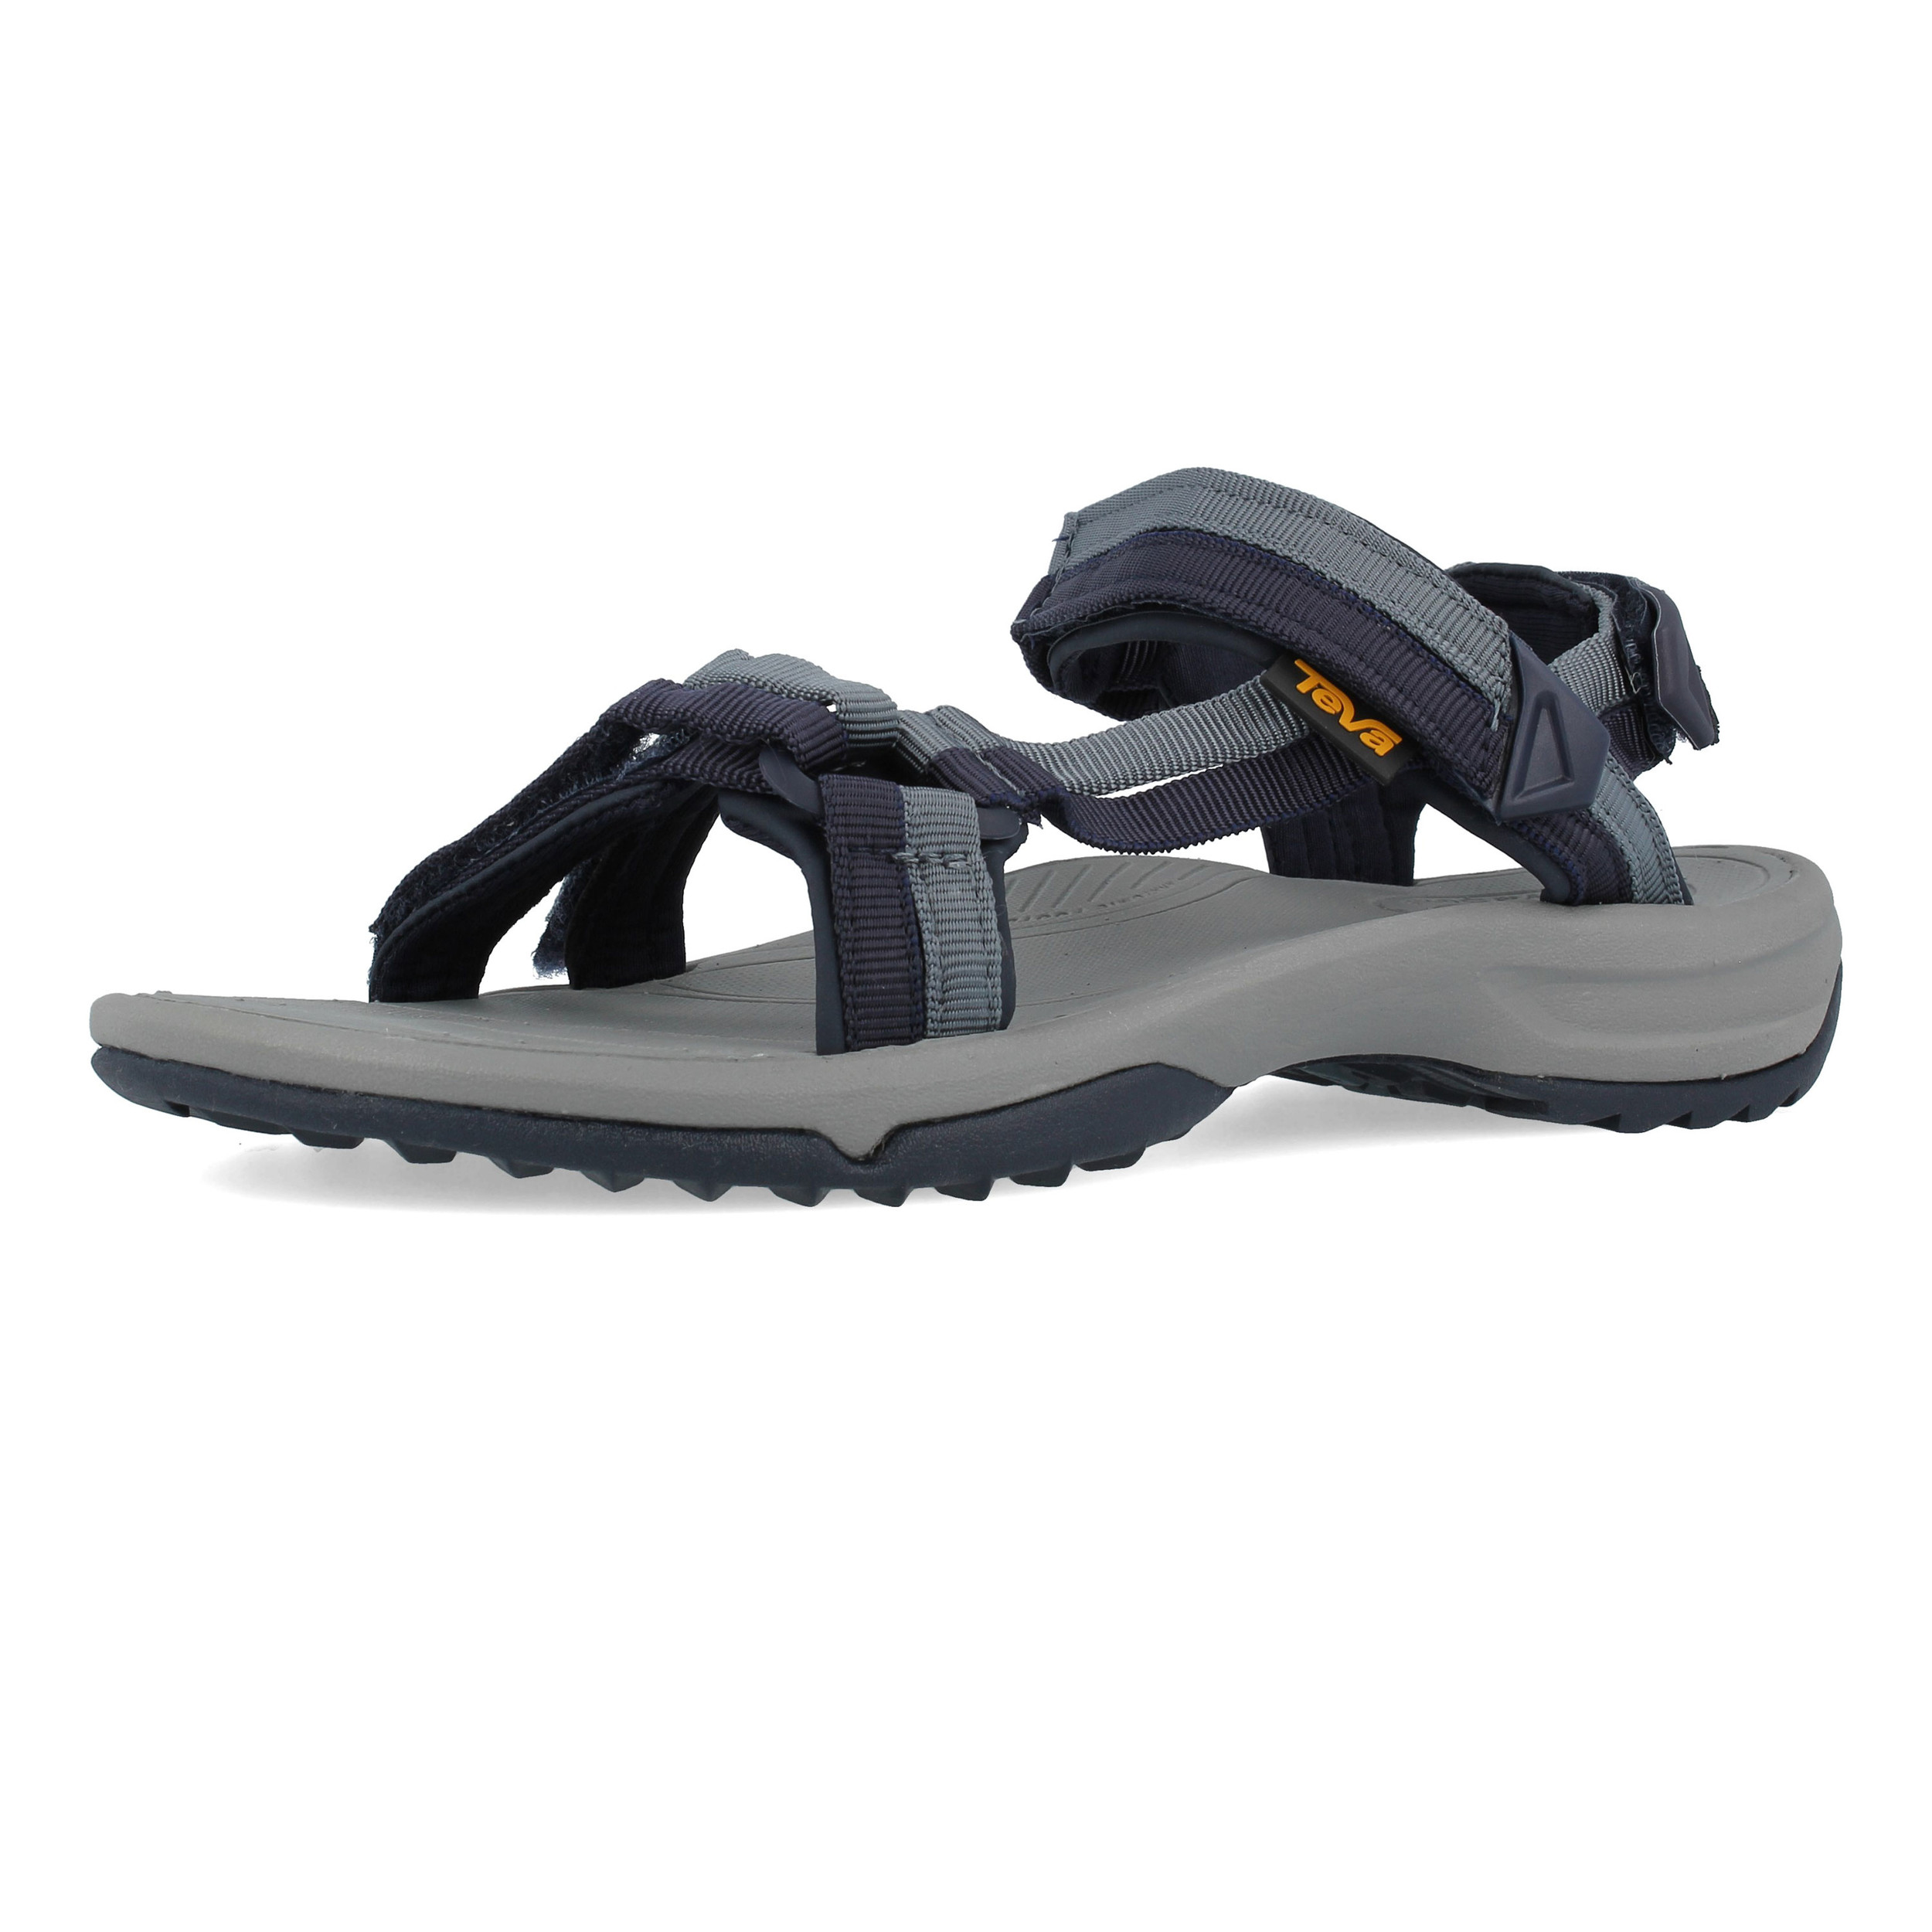 0e5f5bd842b Details about Teva Womens Terra FI Lite Walking Shoes Sandals Navy Blue  Sports Outdoors